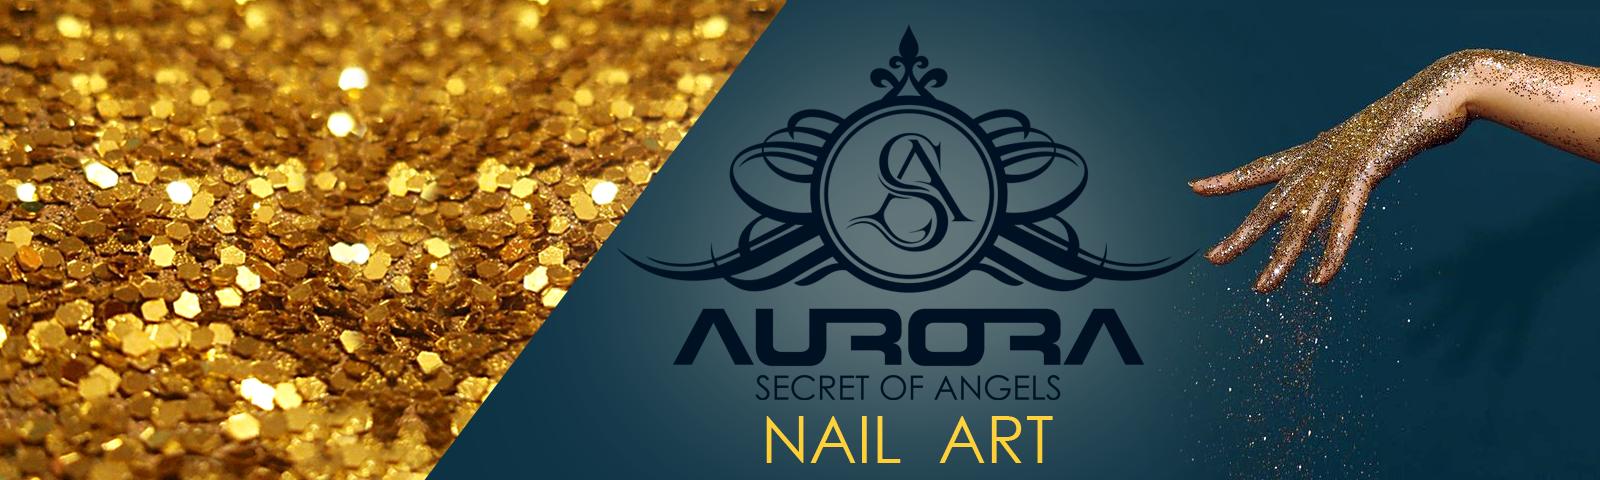 Cumpara Sclipici, Glitter si alte Nail Art de pe AuroraSecret.ro!